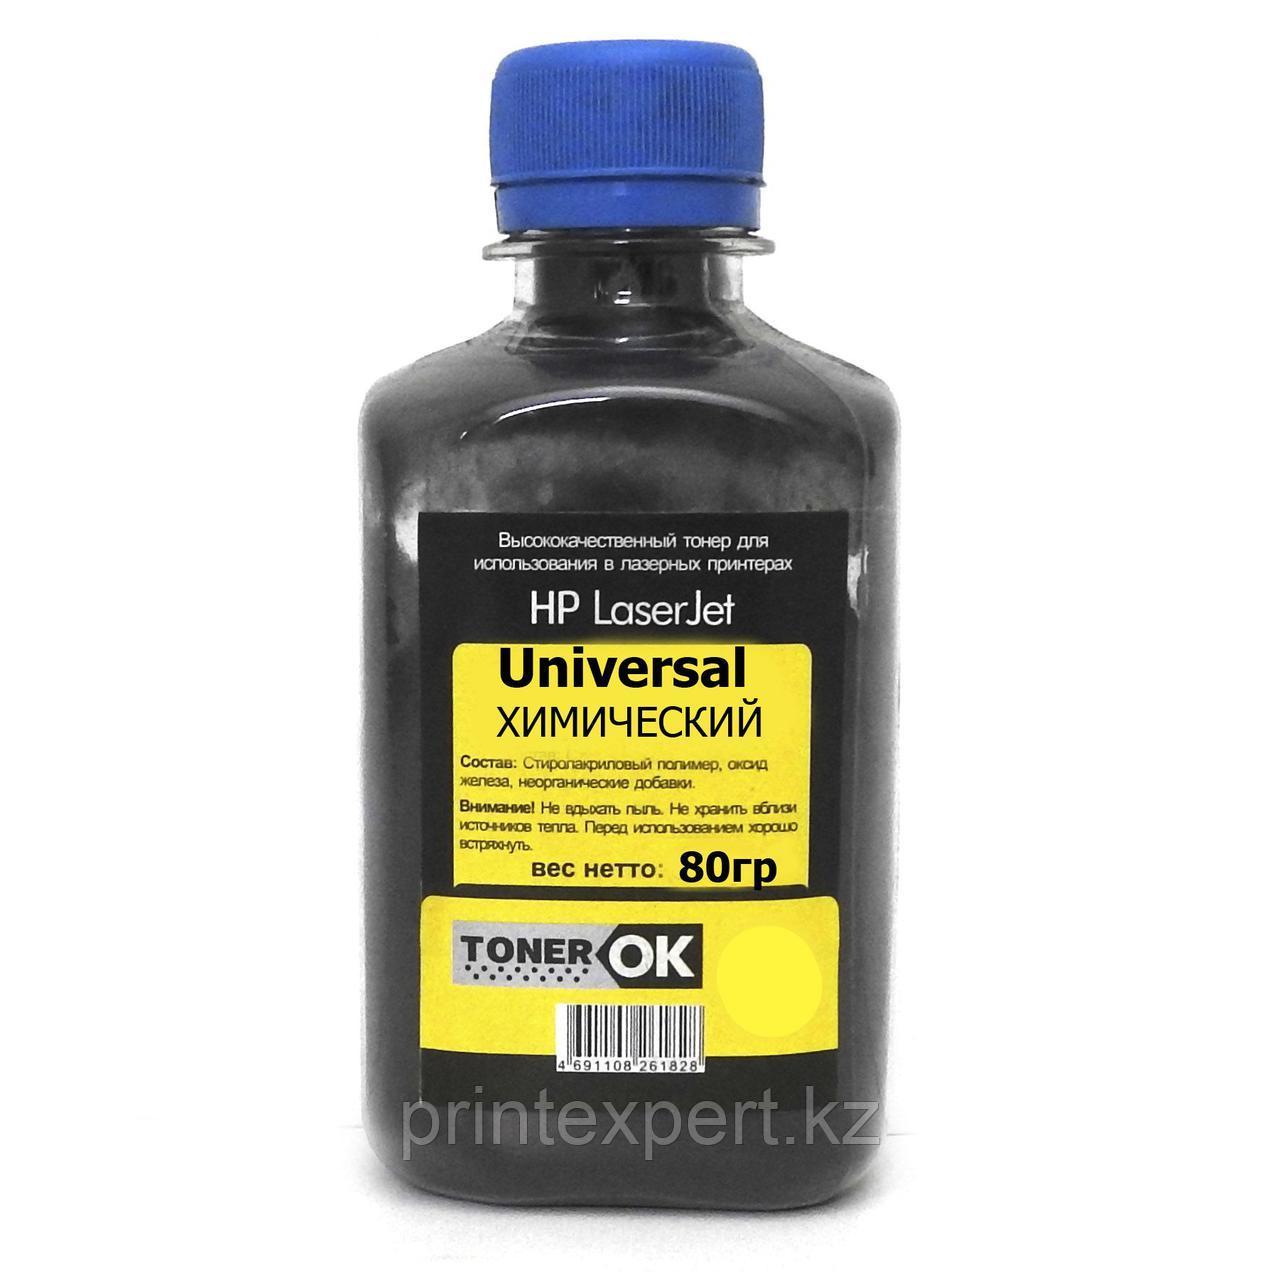 Тонер Toner OK для HP CLJ Universal ХИМИЧЕСКИЙ Yellow (80гр)